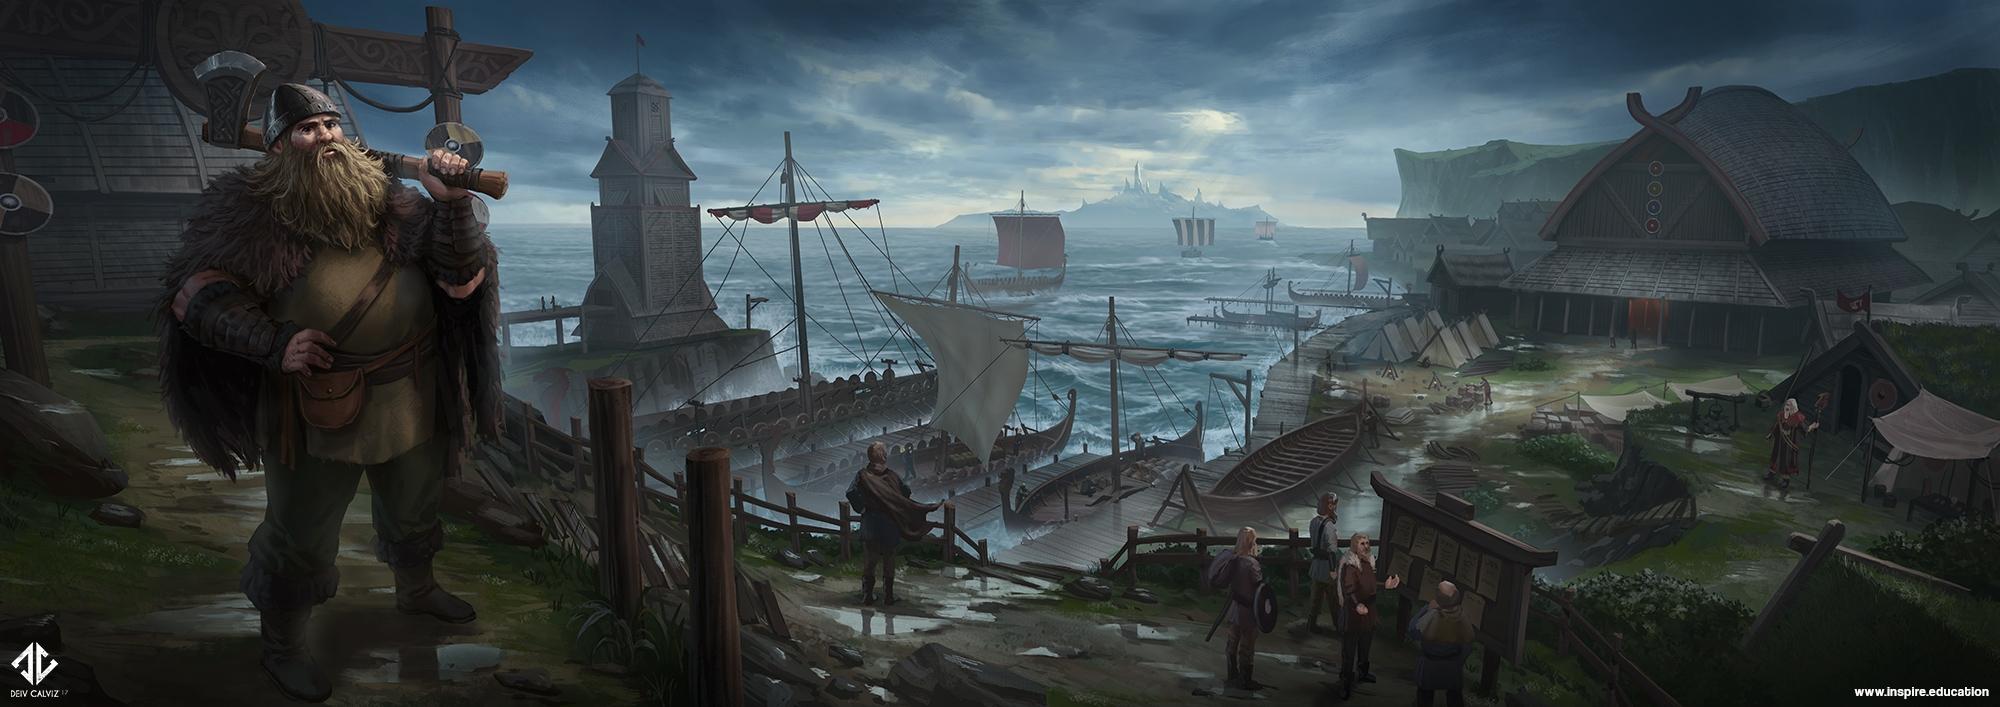 Viking_Deiv_Calviz